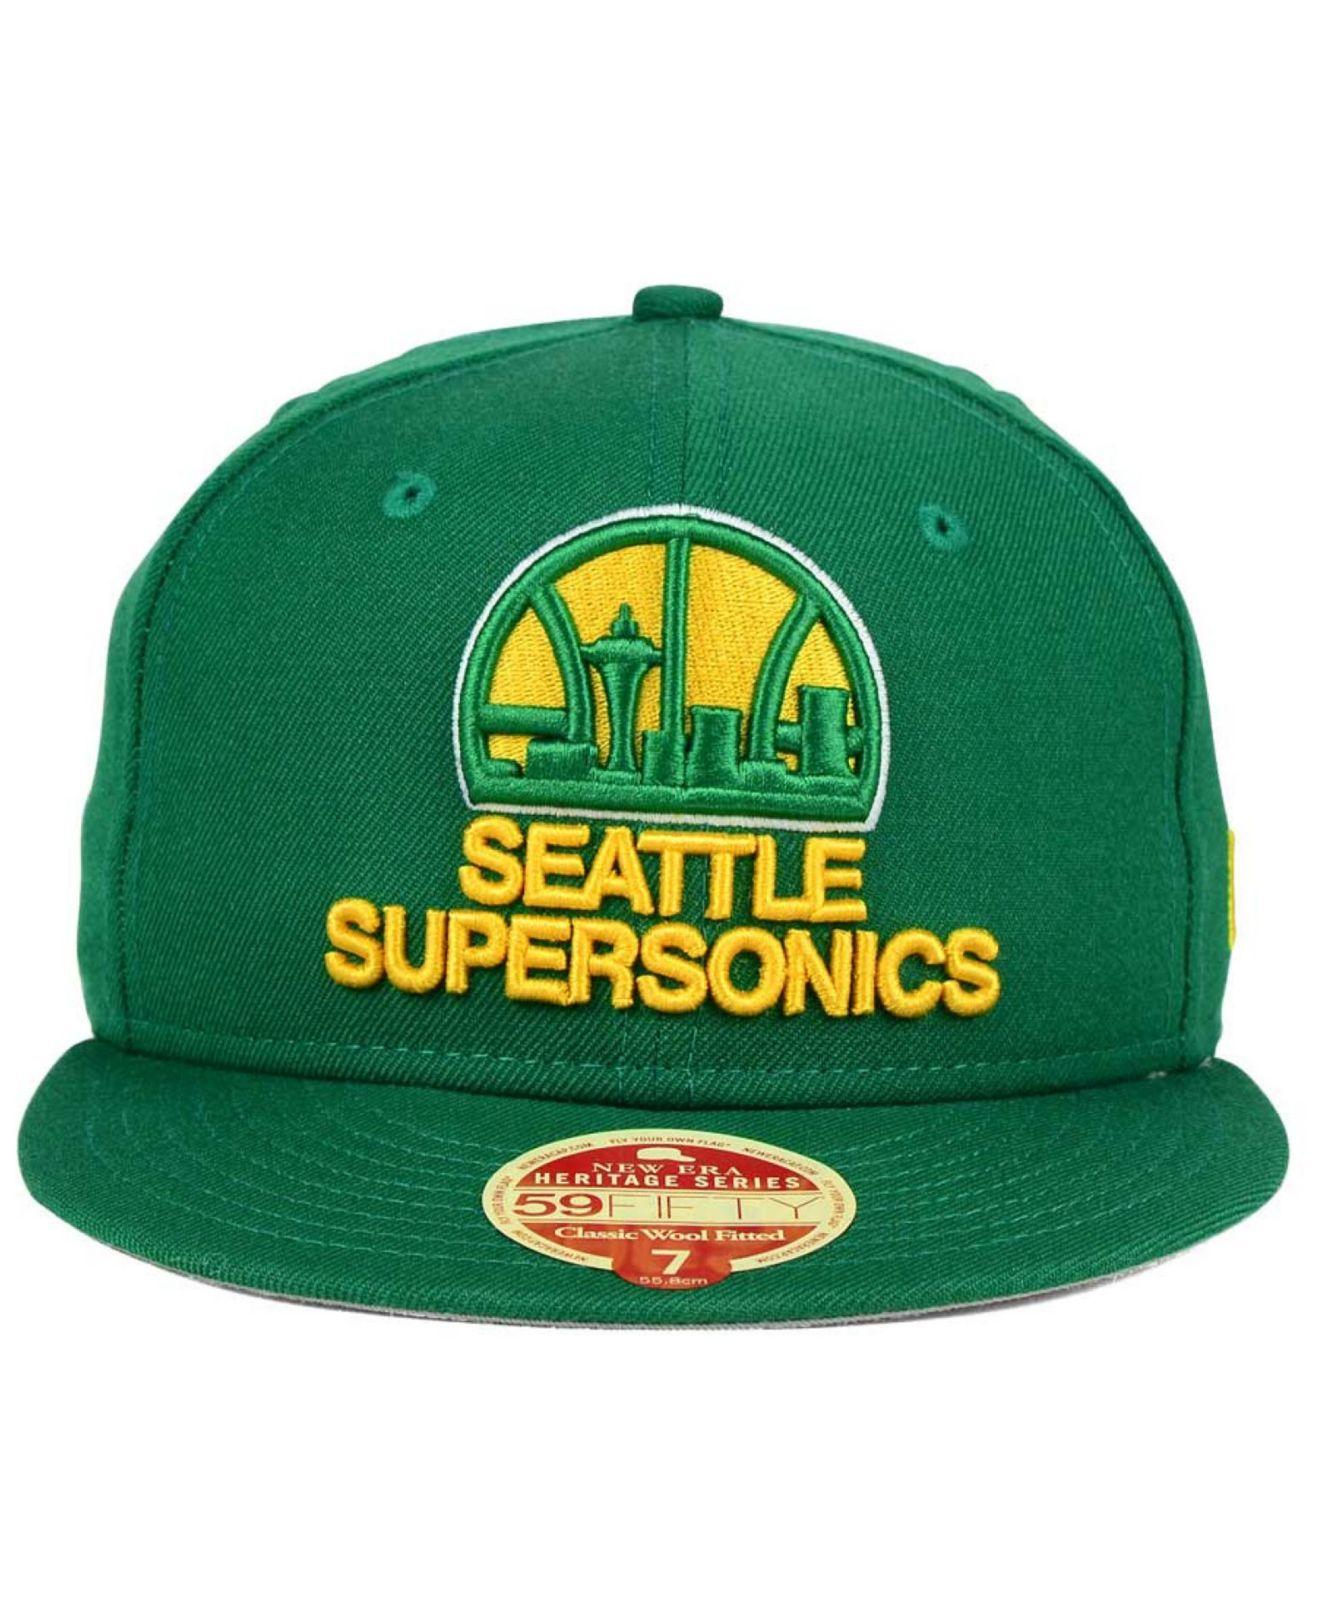 Lyst - Ktz Seattle Supersonics Classic Wool 59fifty Cap in Green for Men 8f3f13cc054e